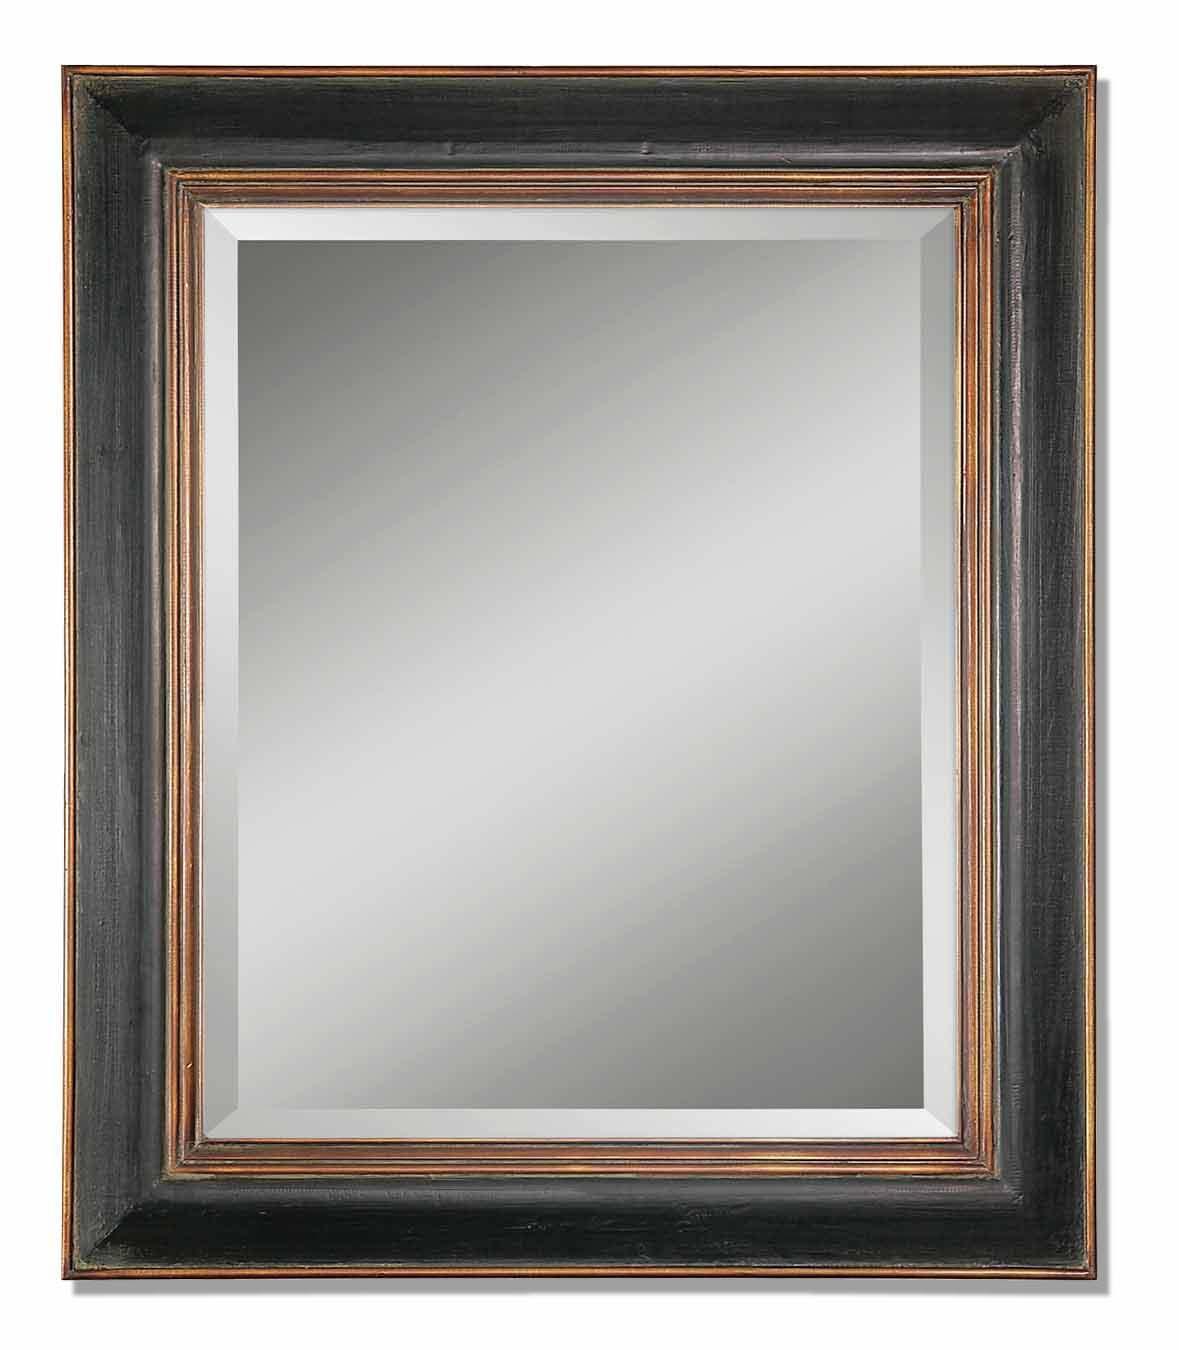 Uttermost Mirrors Fabiano Black Mirror - Item Number: 07023 B